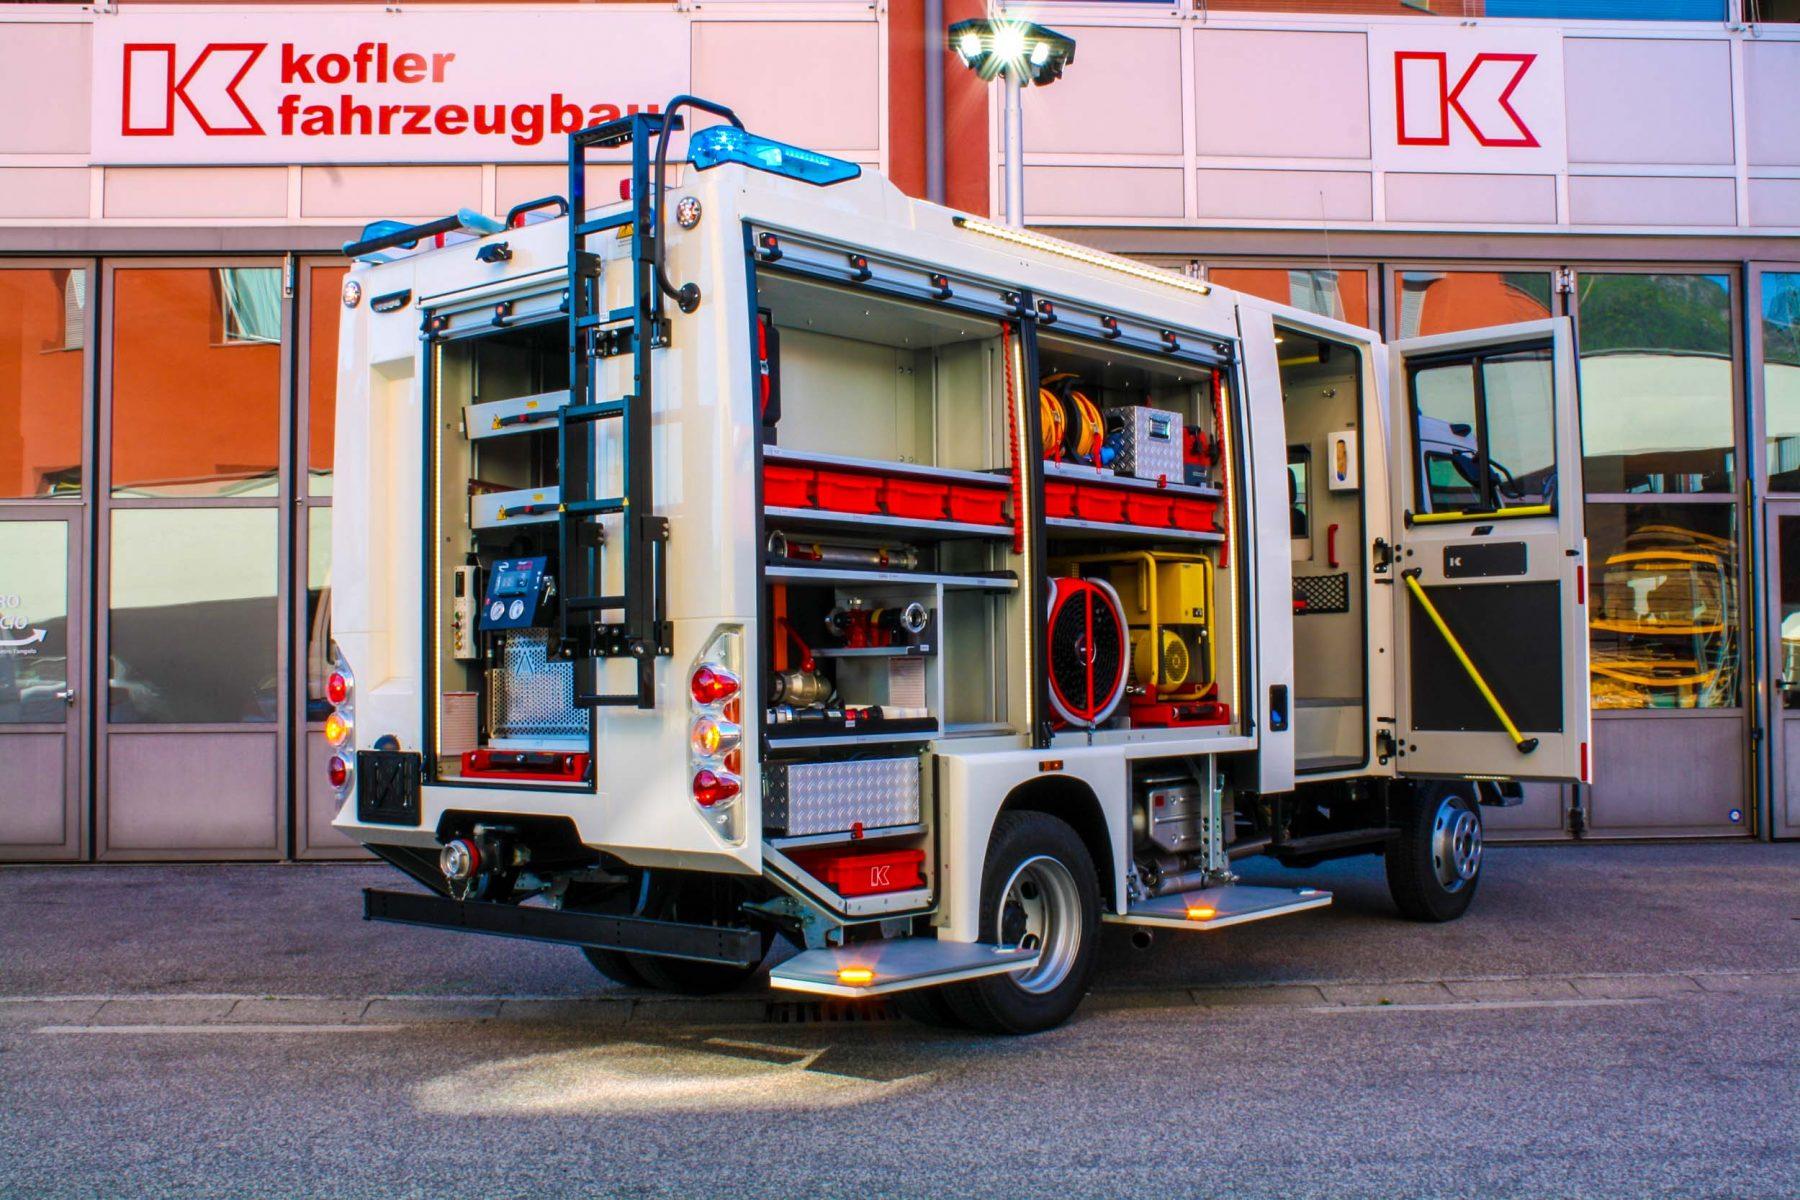 Kofler-Fahrzeugbau-FF-Esslingen